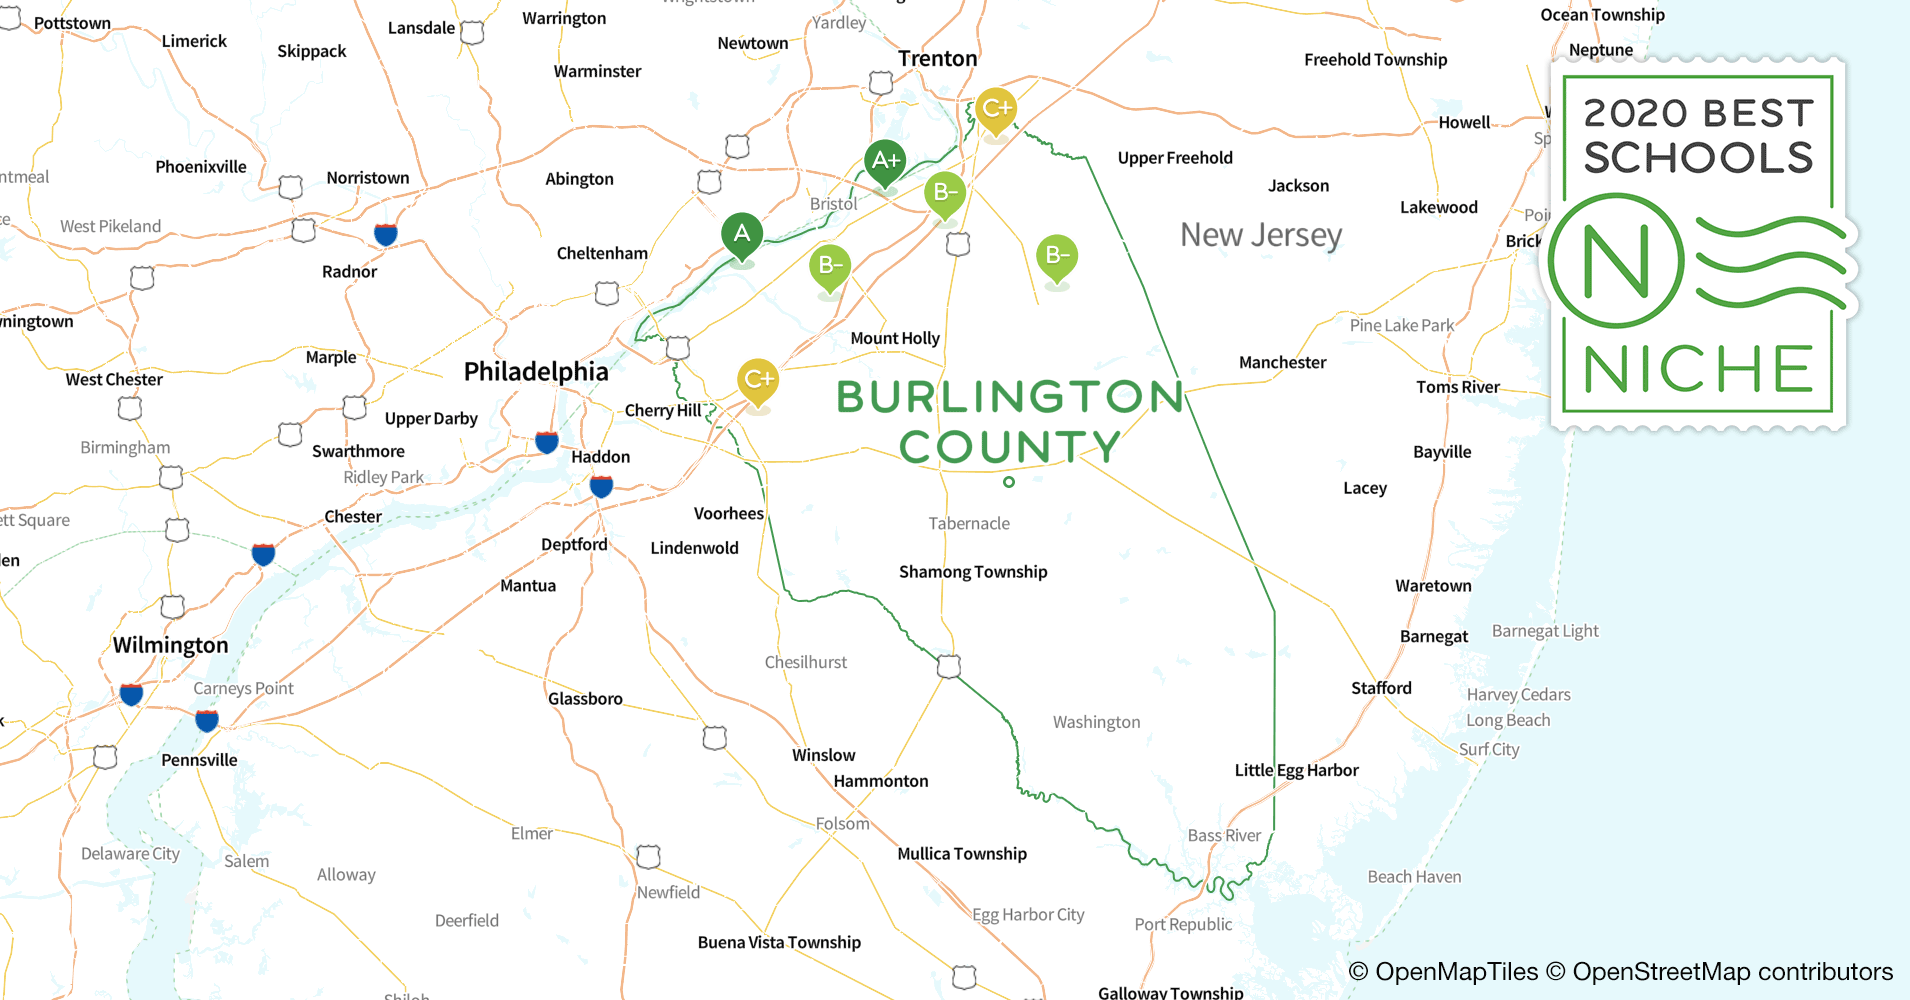 Districts in Burlington County, NJ - Niche on somerset park nj map, stafford county nj map, south jersey, bordentown nj map, south bound brook nj map, ocean county nj map, bergen county nj map, atlantic county nj map, monmouth county, hudson county, cape may county, essex county, middlesex county, cumberland county, hunterdon county, mount laurel nj map, atlantic county, westampton nj map, gloucester county nj map, ocean county, passaic county, camden county, salem county nj map, bergen county, mercer county, warren county, blue anchor nj map, cherry hill nj map, gloucester county, lakehurst nj map, historic smithville nj trail map, wharton state forest nj map, monmouth county nj map, mercer county nj map, vista center nj map, somerset county, morris county, cumberland county nj map, union county,